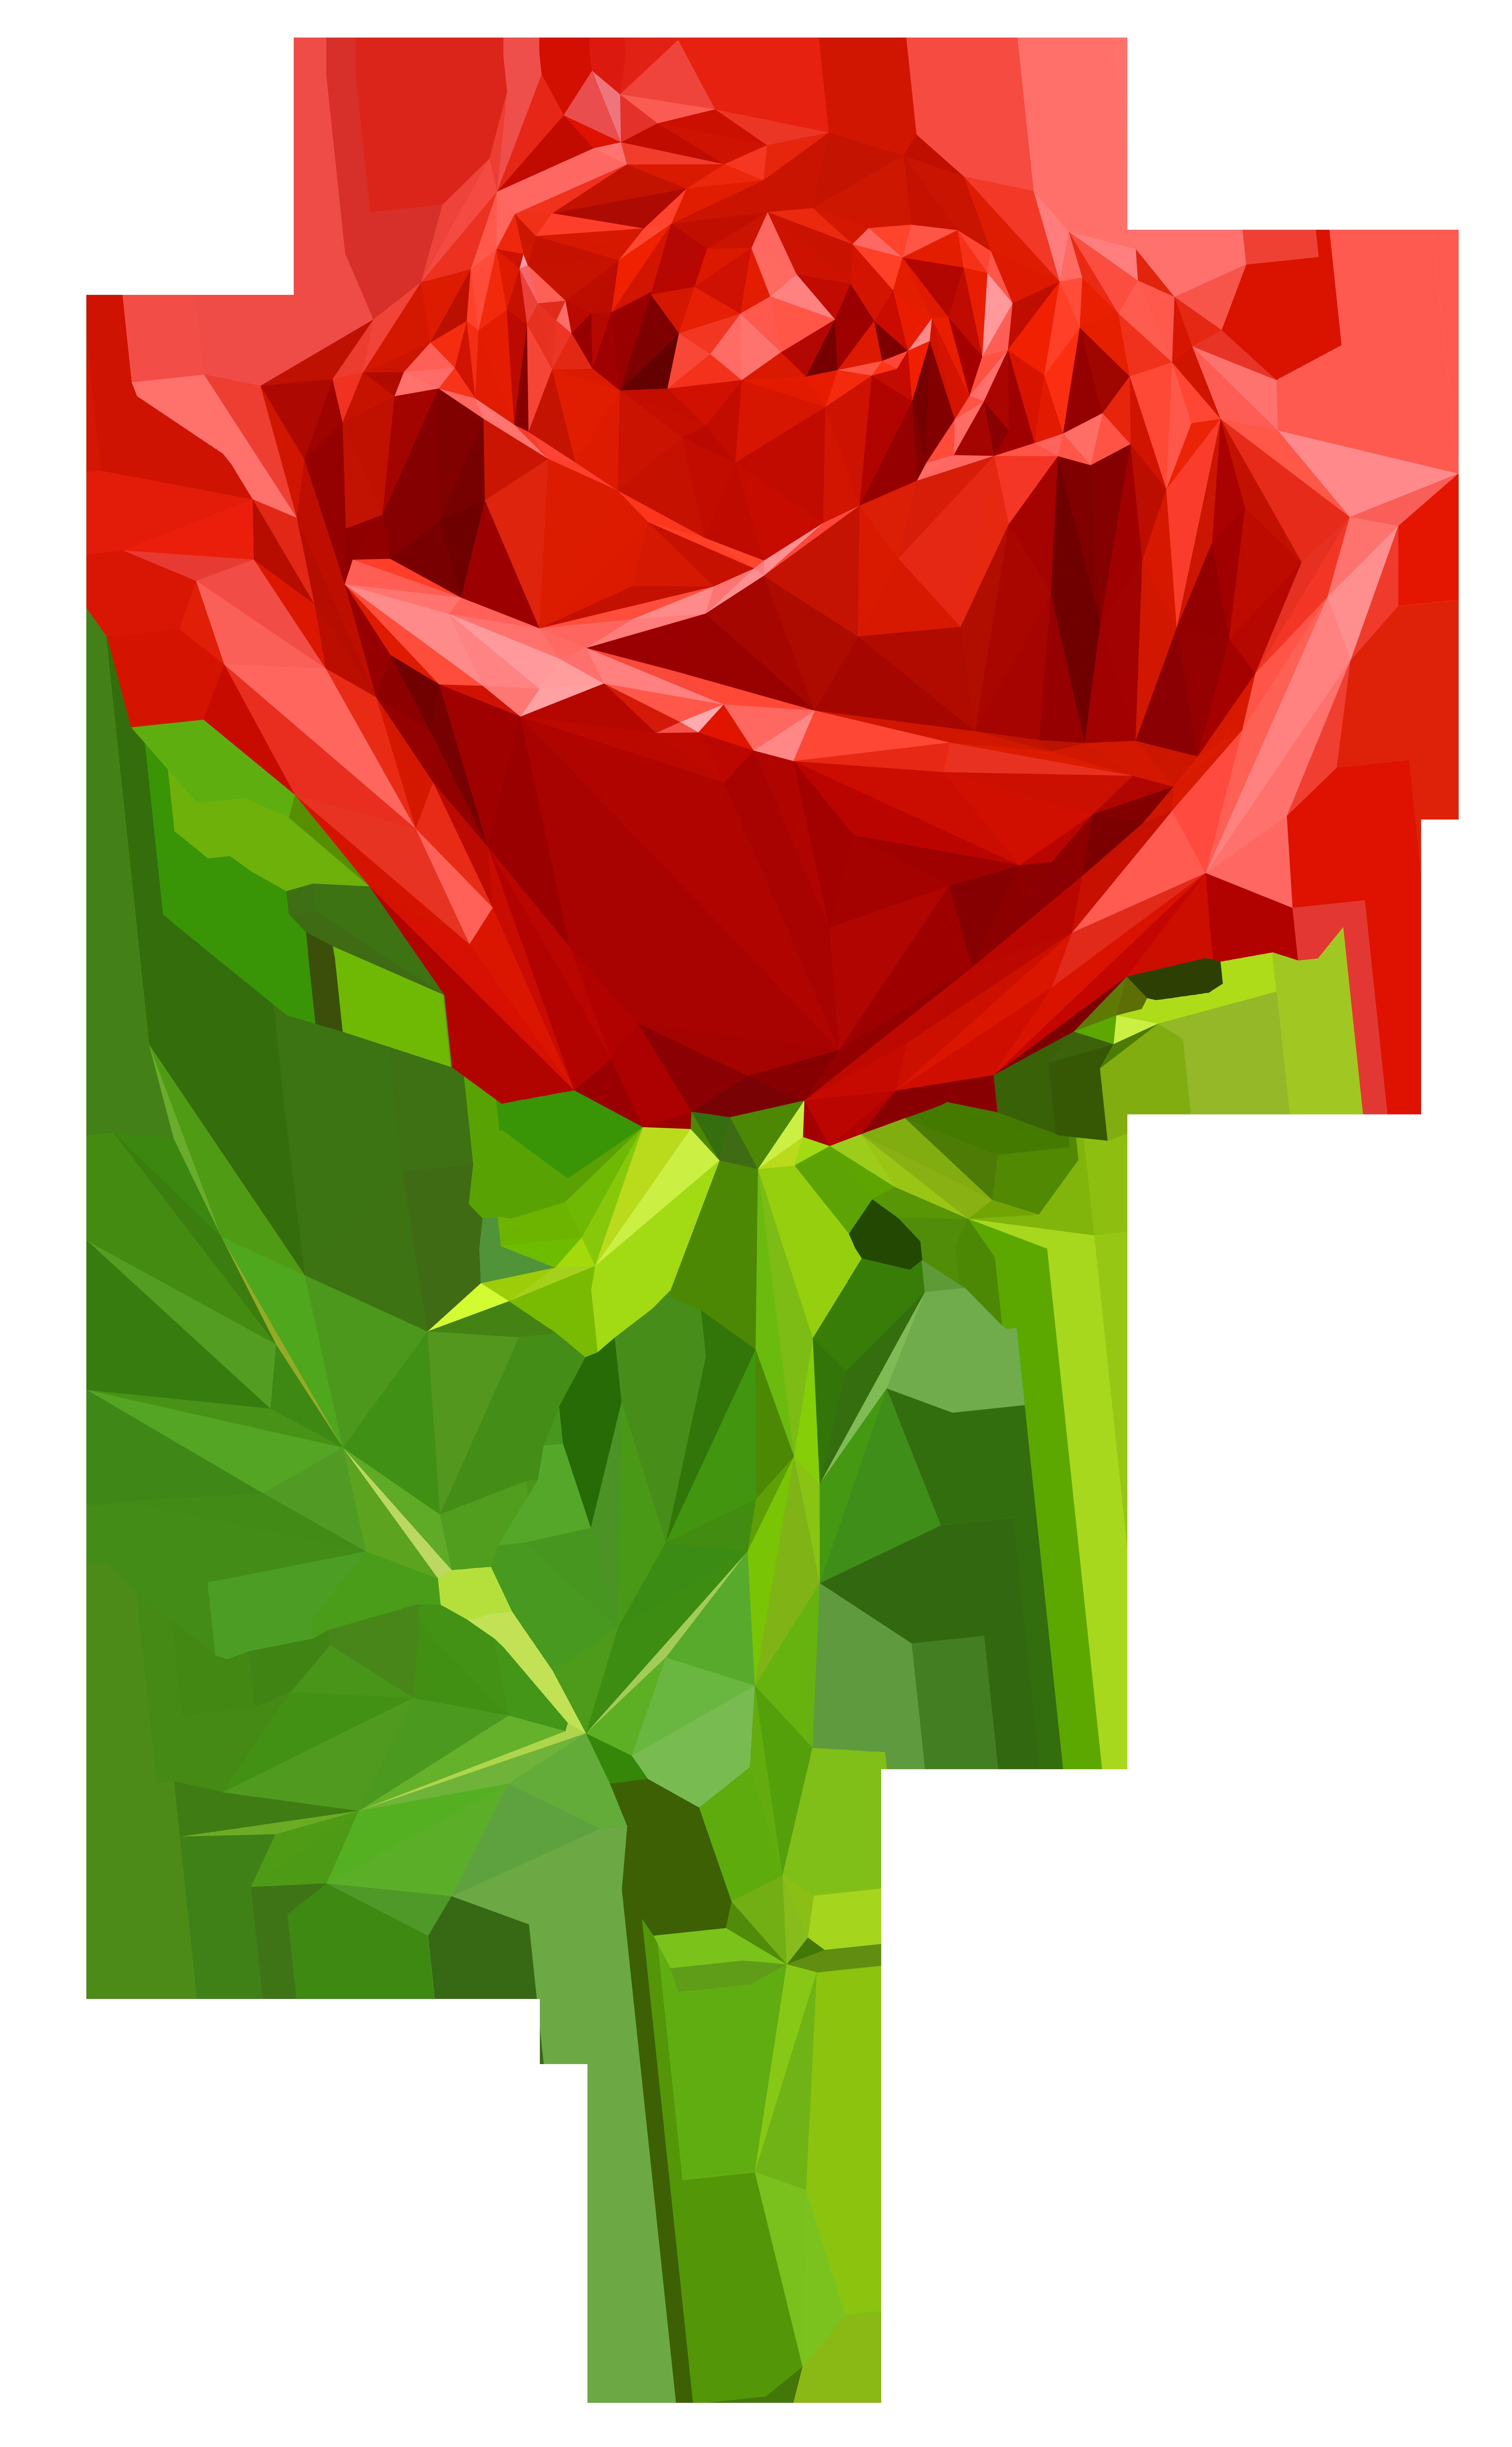 5271x8531 Crystal Red Rose Transparent Png Clip Art Imageu200b Gallery